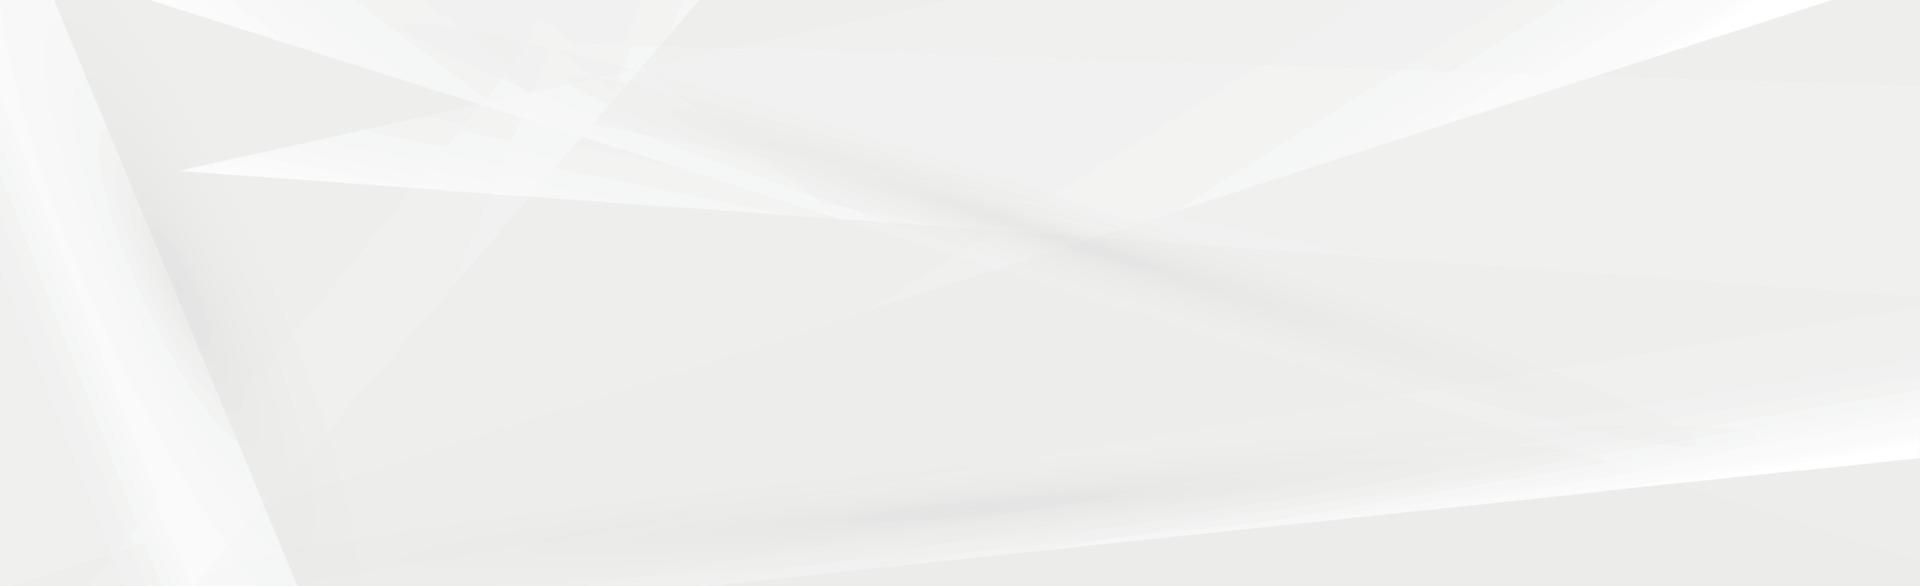 sfondo panoramico vettoriale bianco con linee ondulate